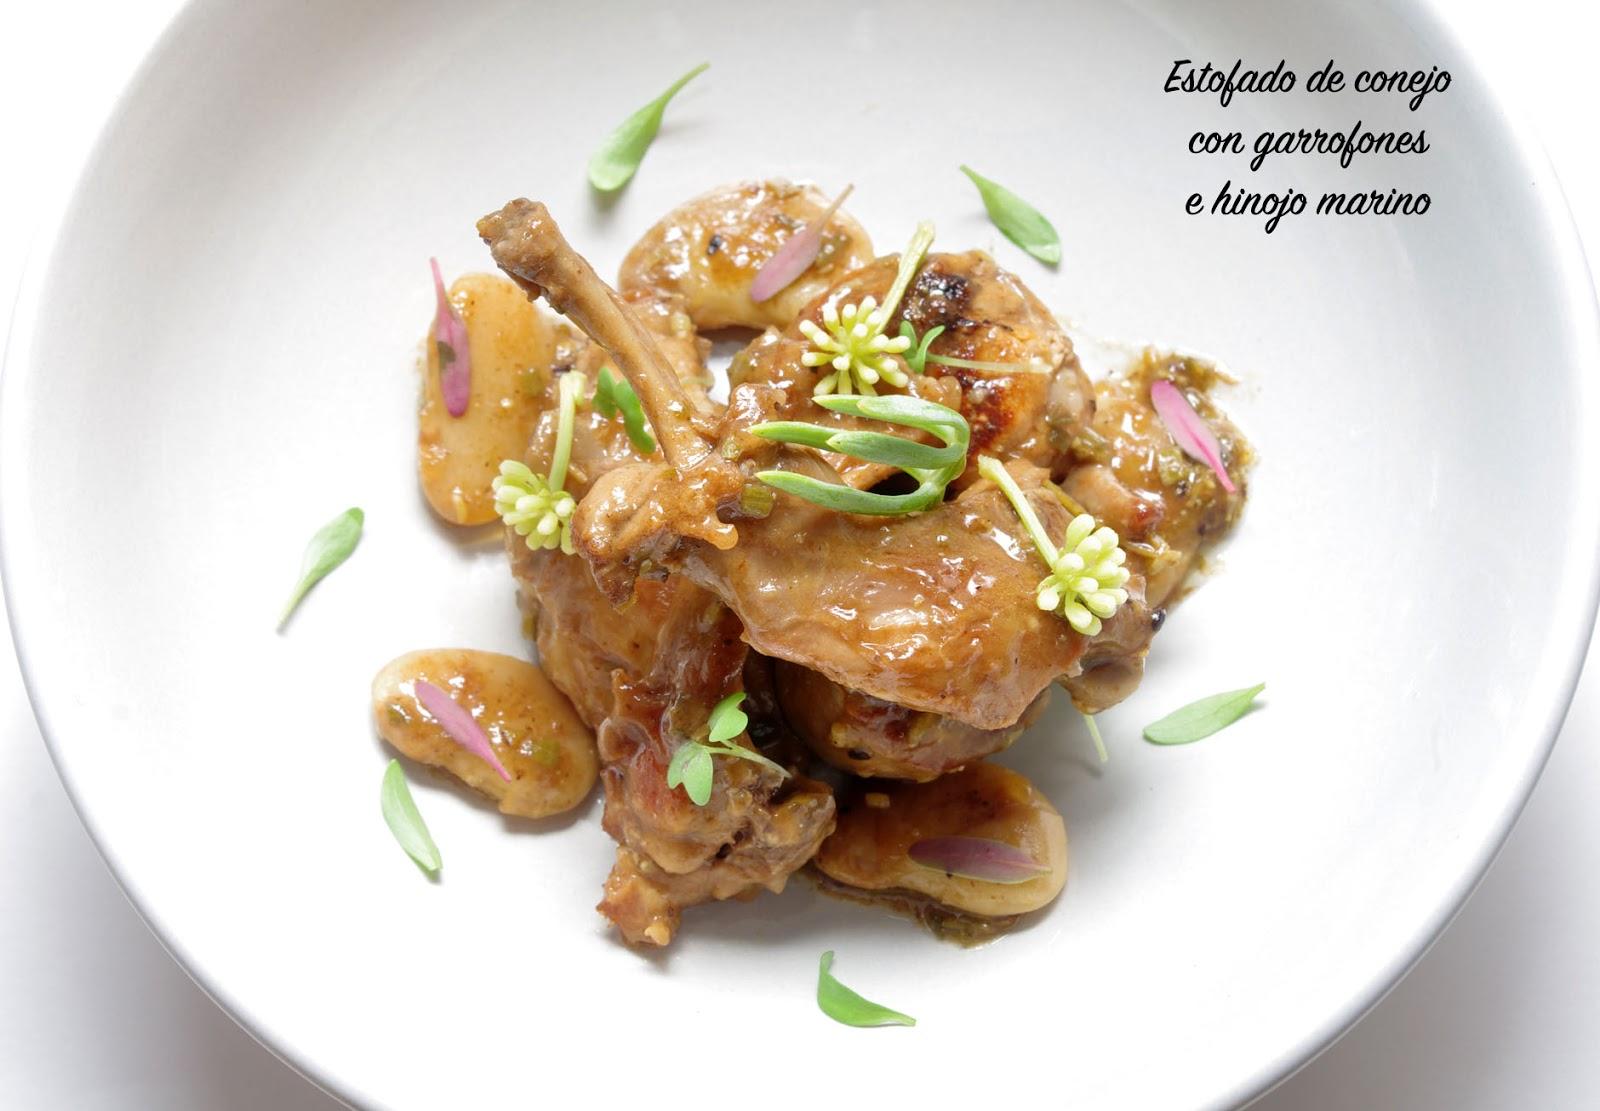 Fentdetutto: Estofado de conejo con garrofones e hinojo marino